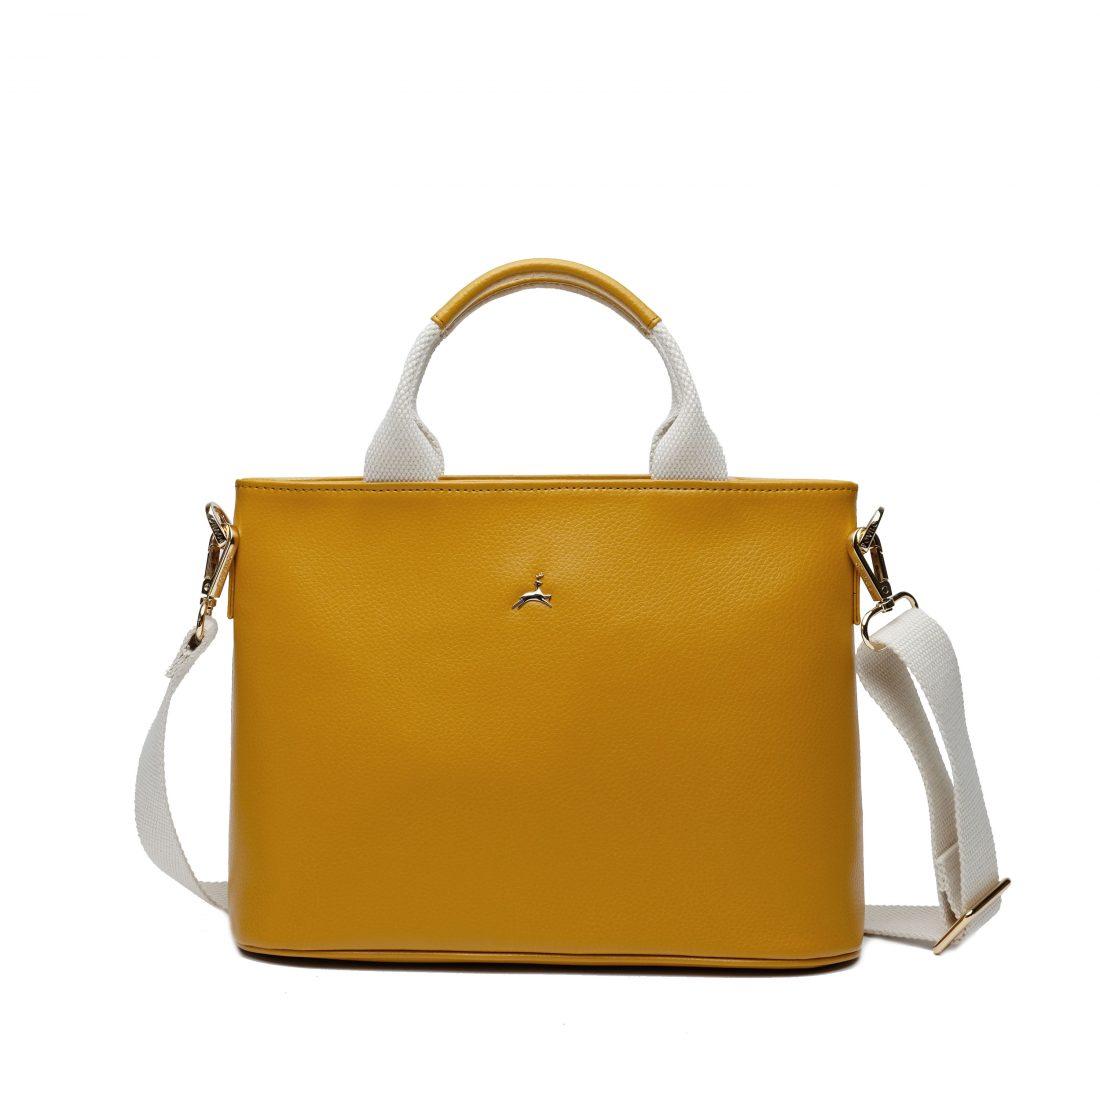 nona-bag-yellow-1